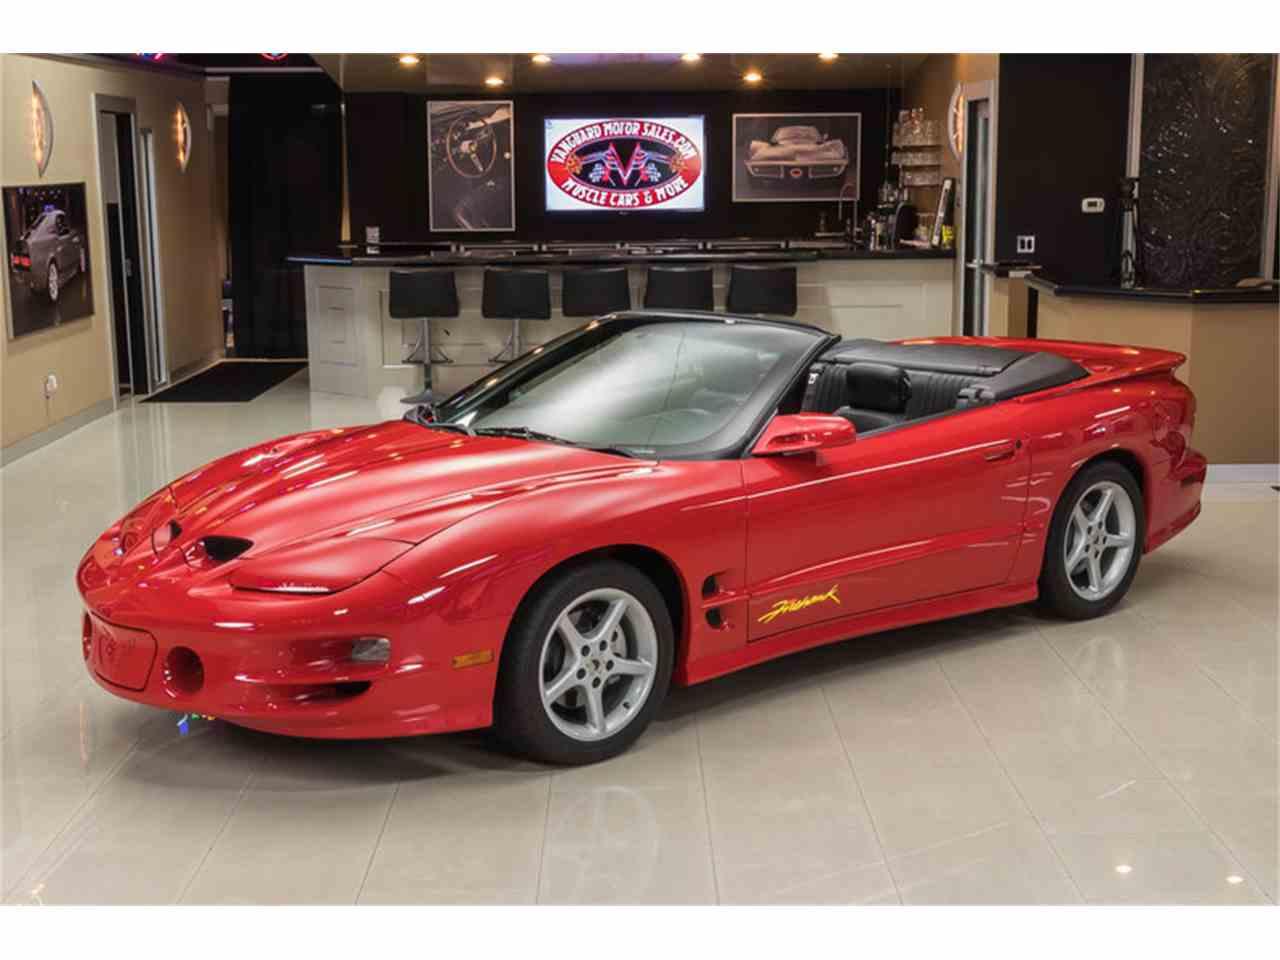 2002 pontiac firebird trans am firehawk convertible for sale cc 991025. Black Bedroom Furniture Sets. Home Design Ideas